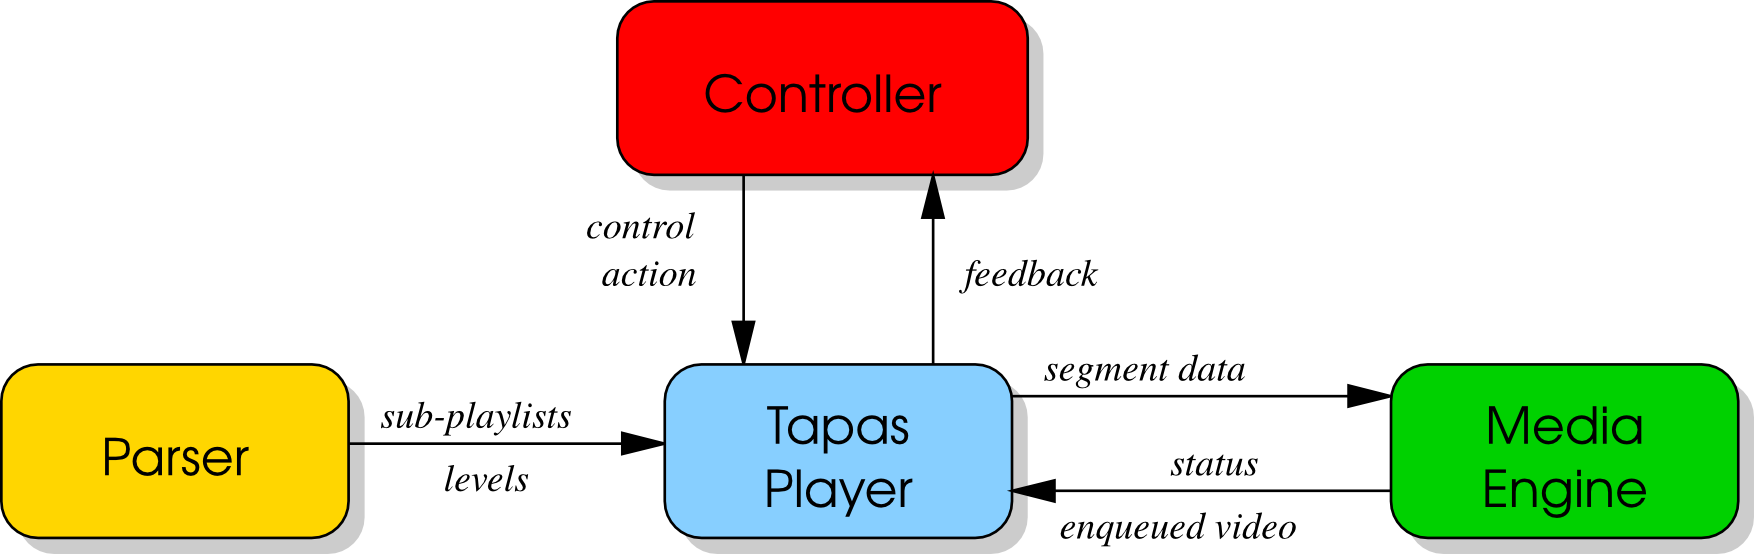 TAPAS architecture